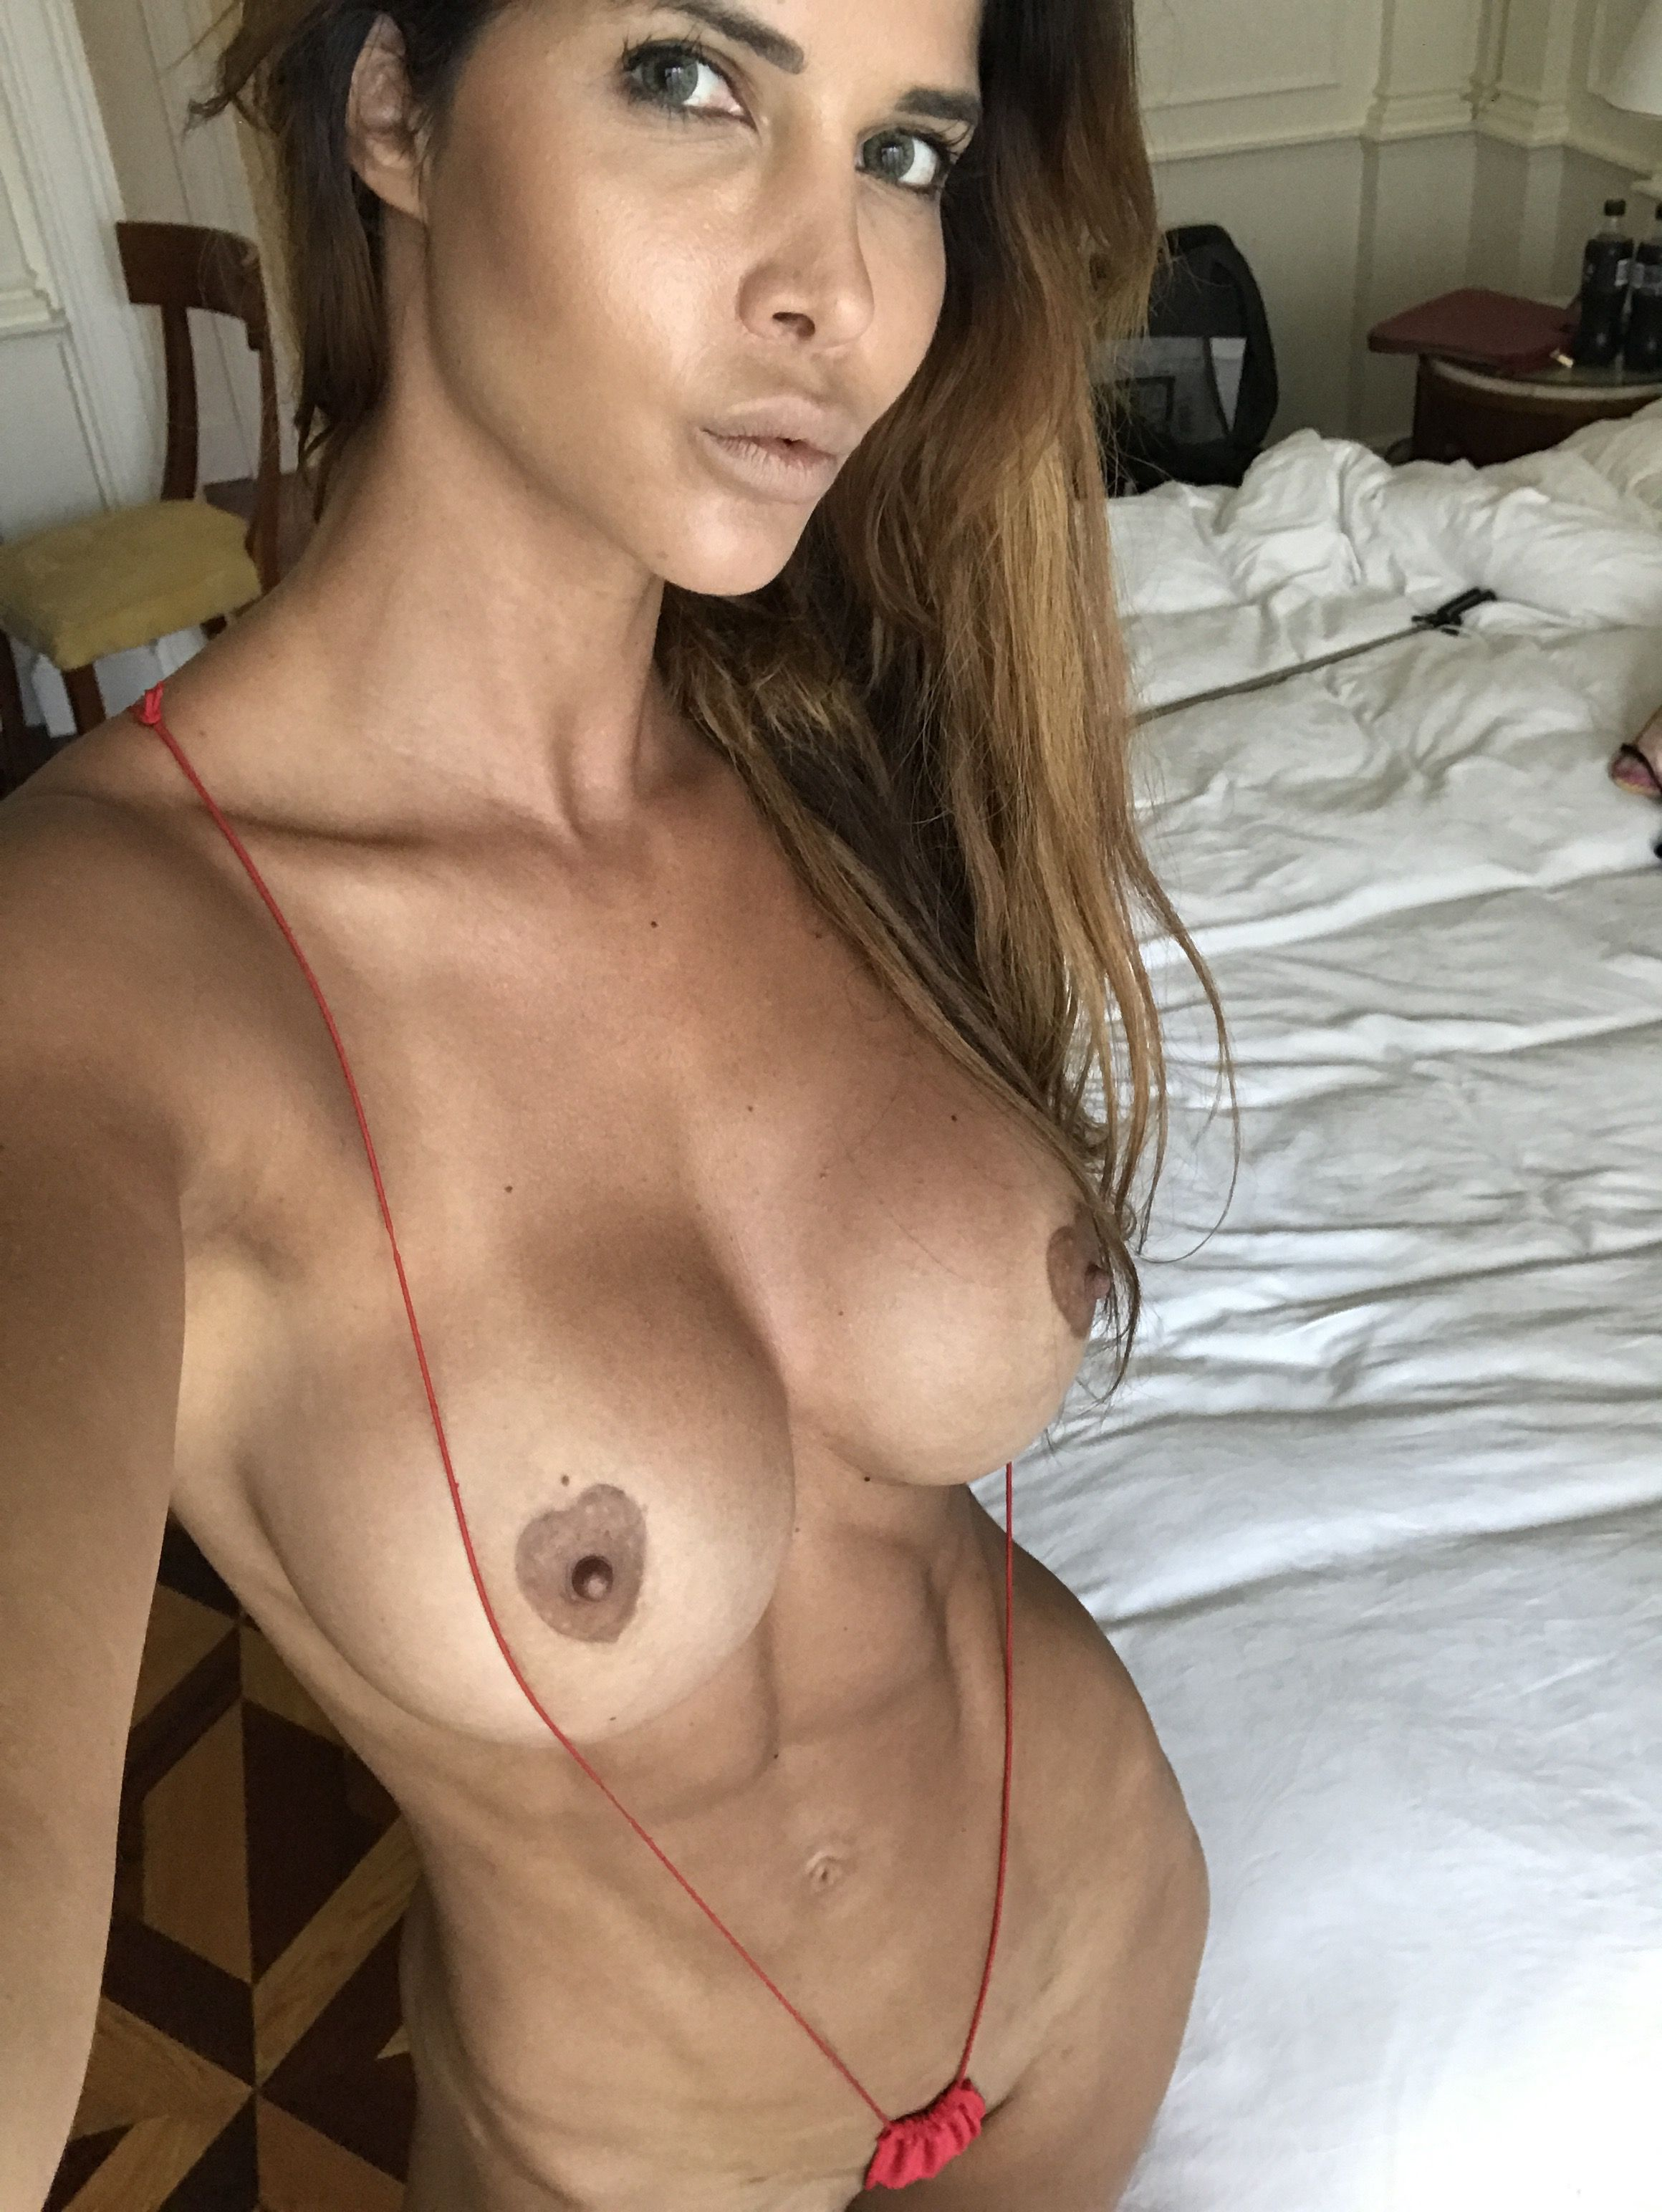 Fappening Micaela Schafer nude (25 foto and video), Topless, Bikini, Instagram, cameltoe 2015